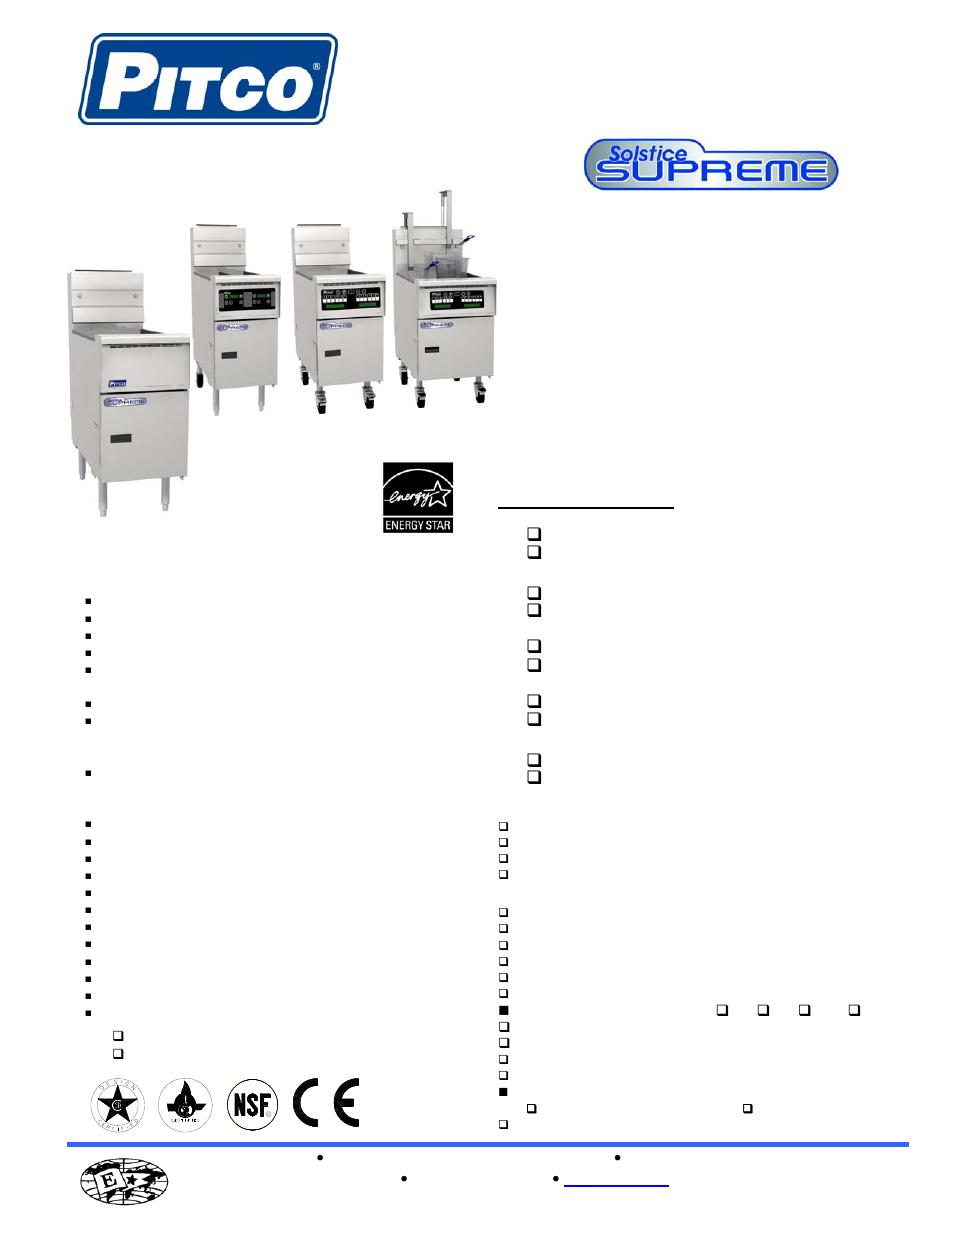 Pitco Frialator Solstice Supreme Ssh55t User Manual 2